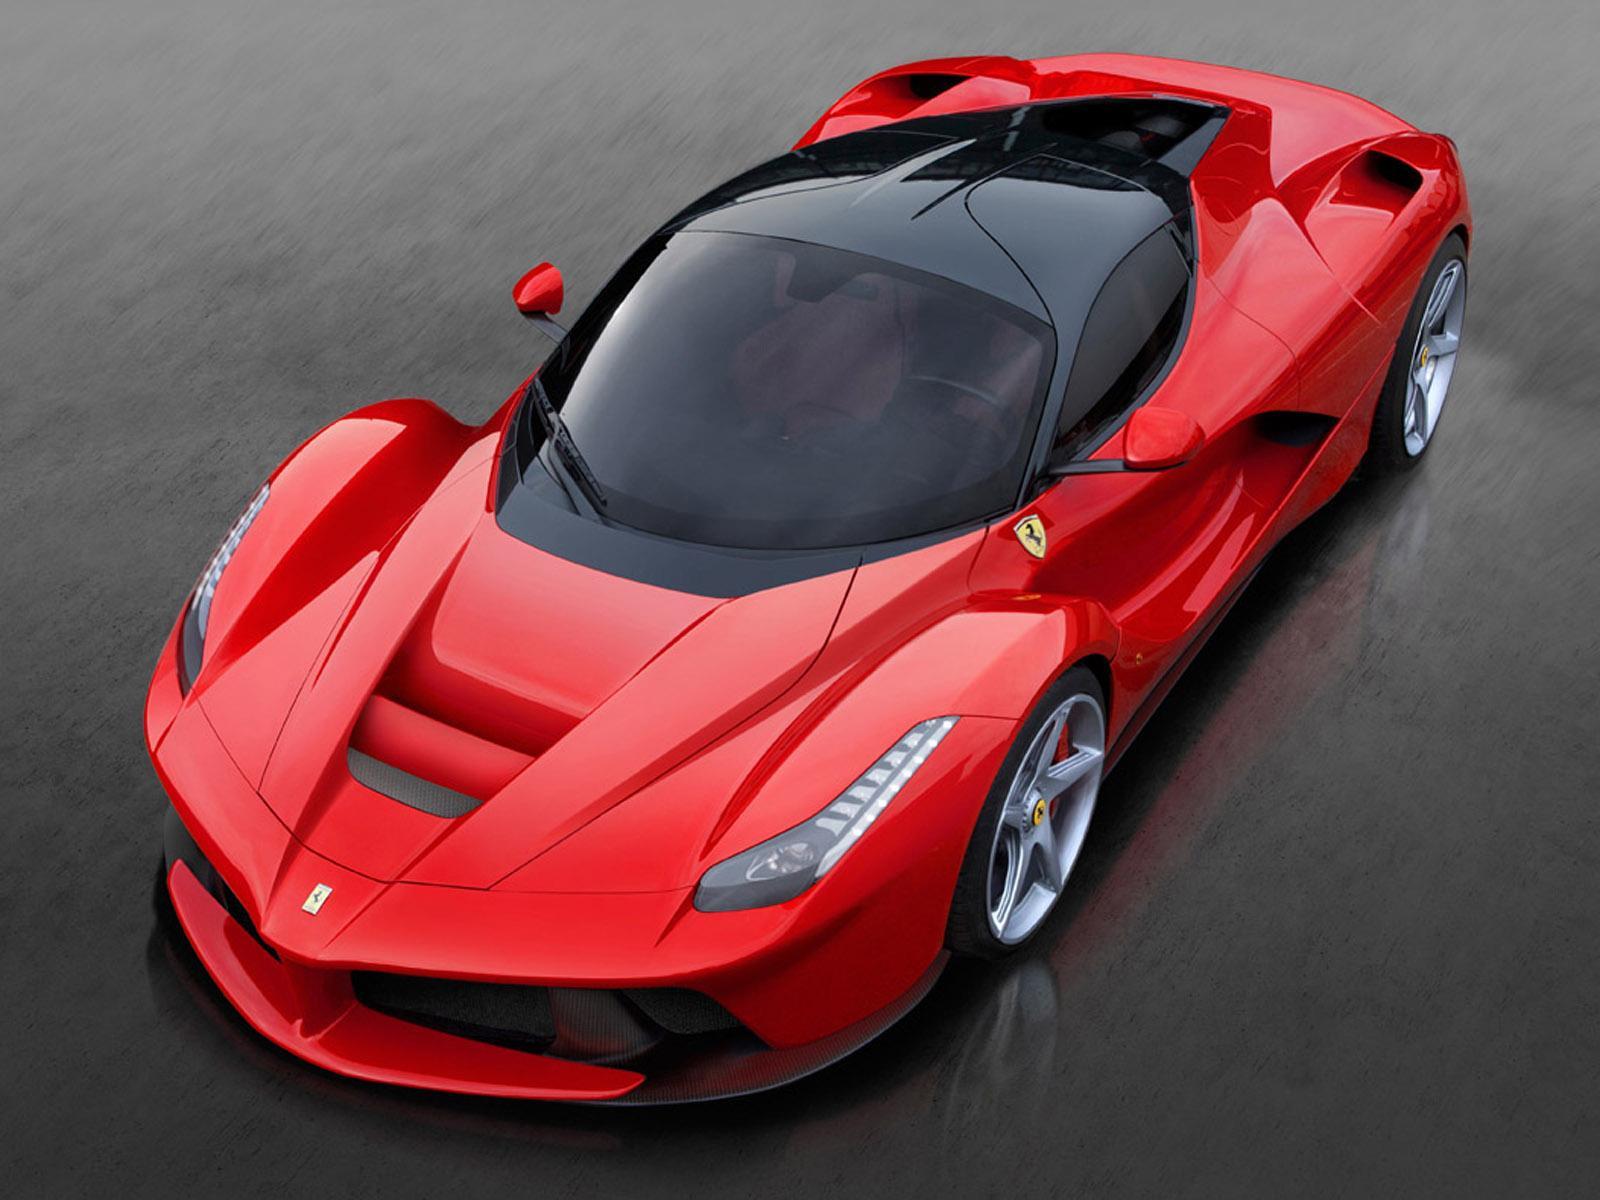 Salón de Ginebra 2013 - Ferrari presenta LaFerrari, 963 CV de ...